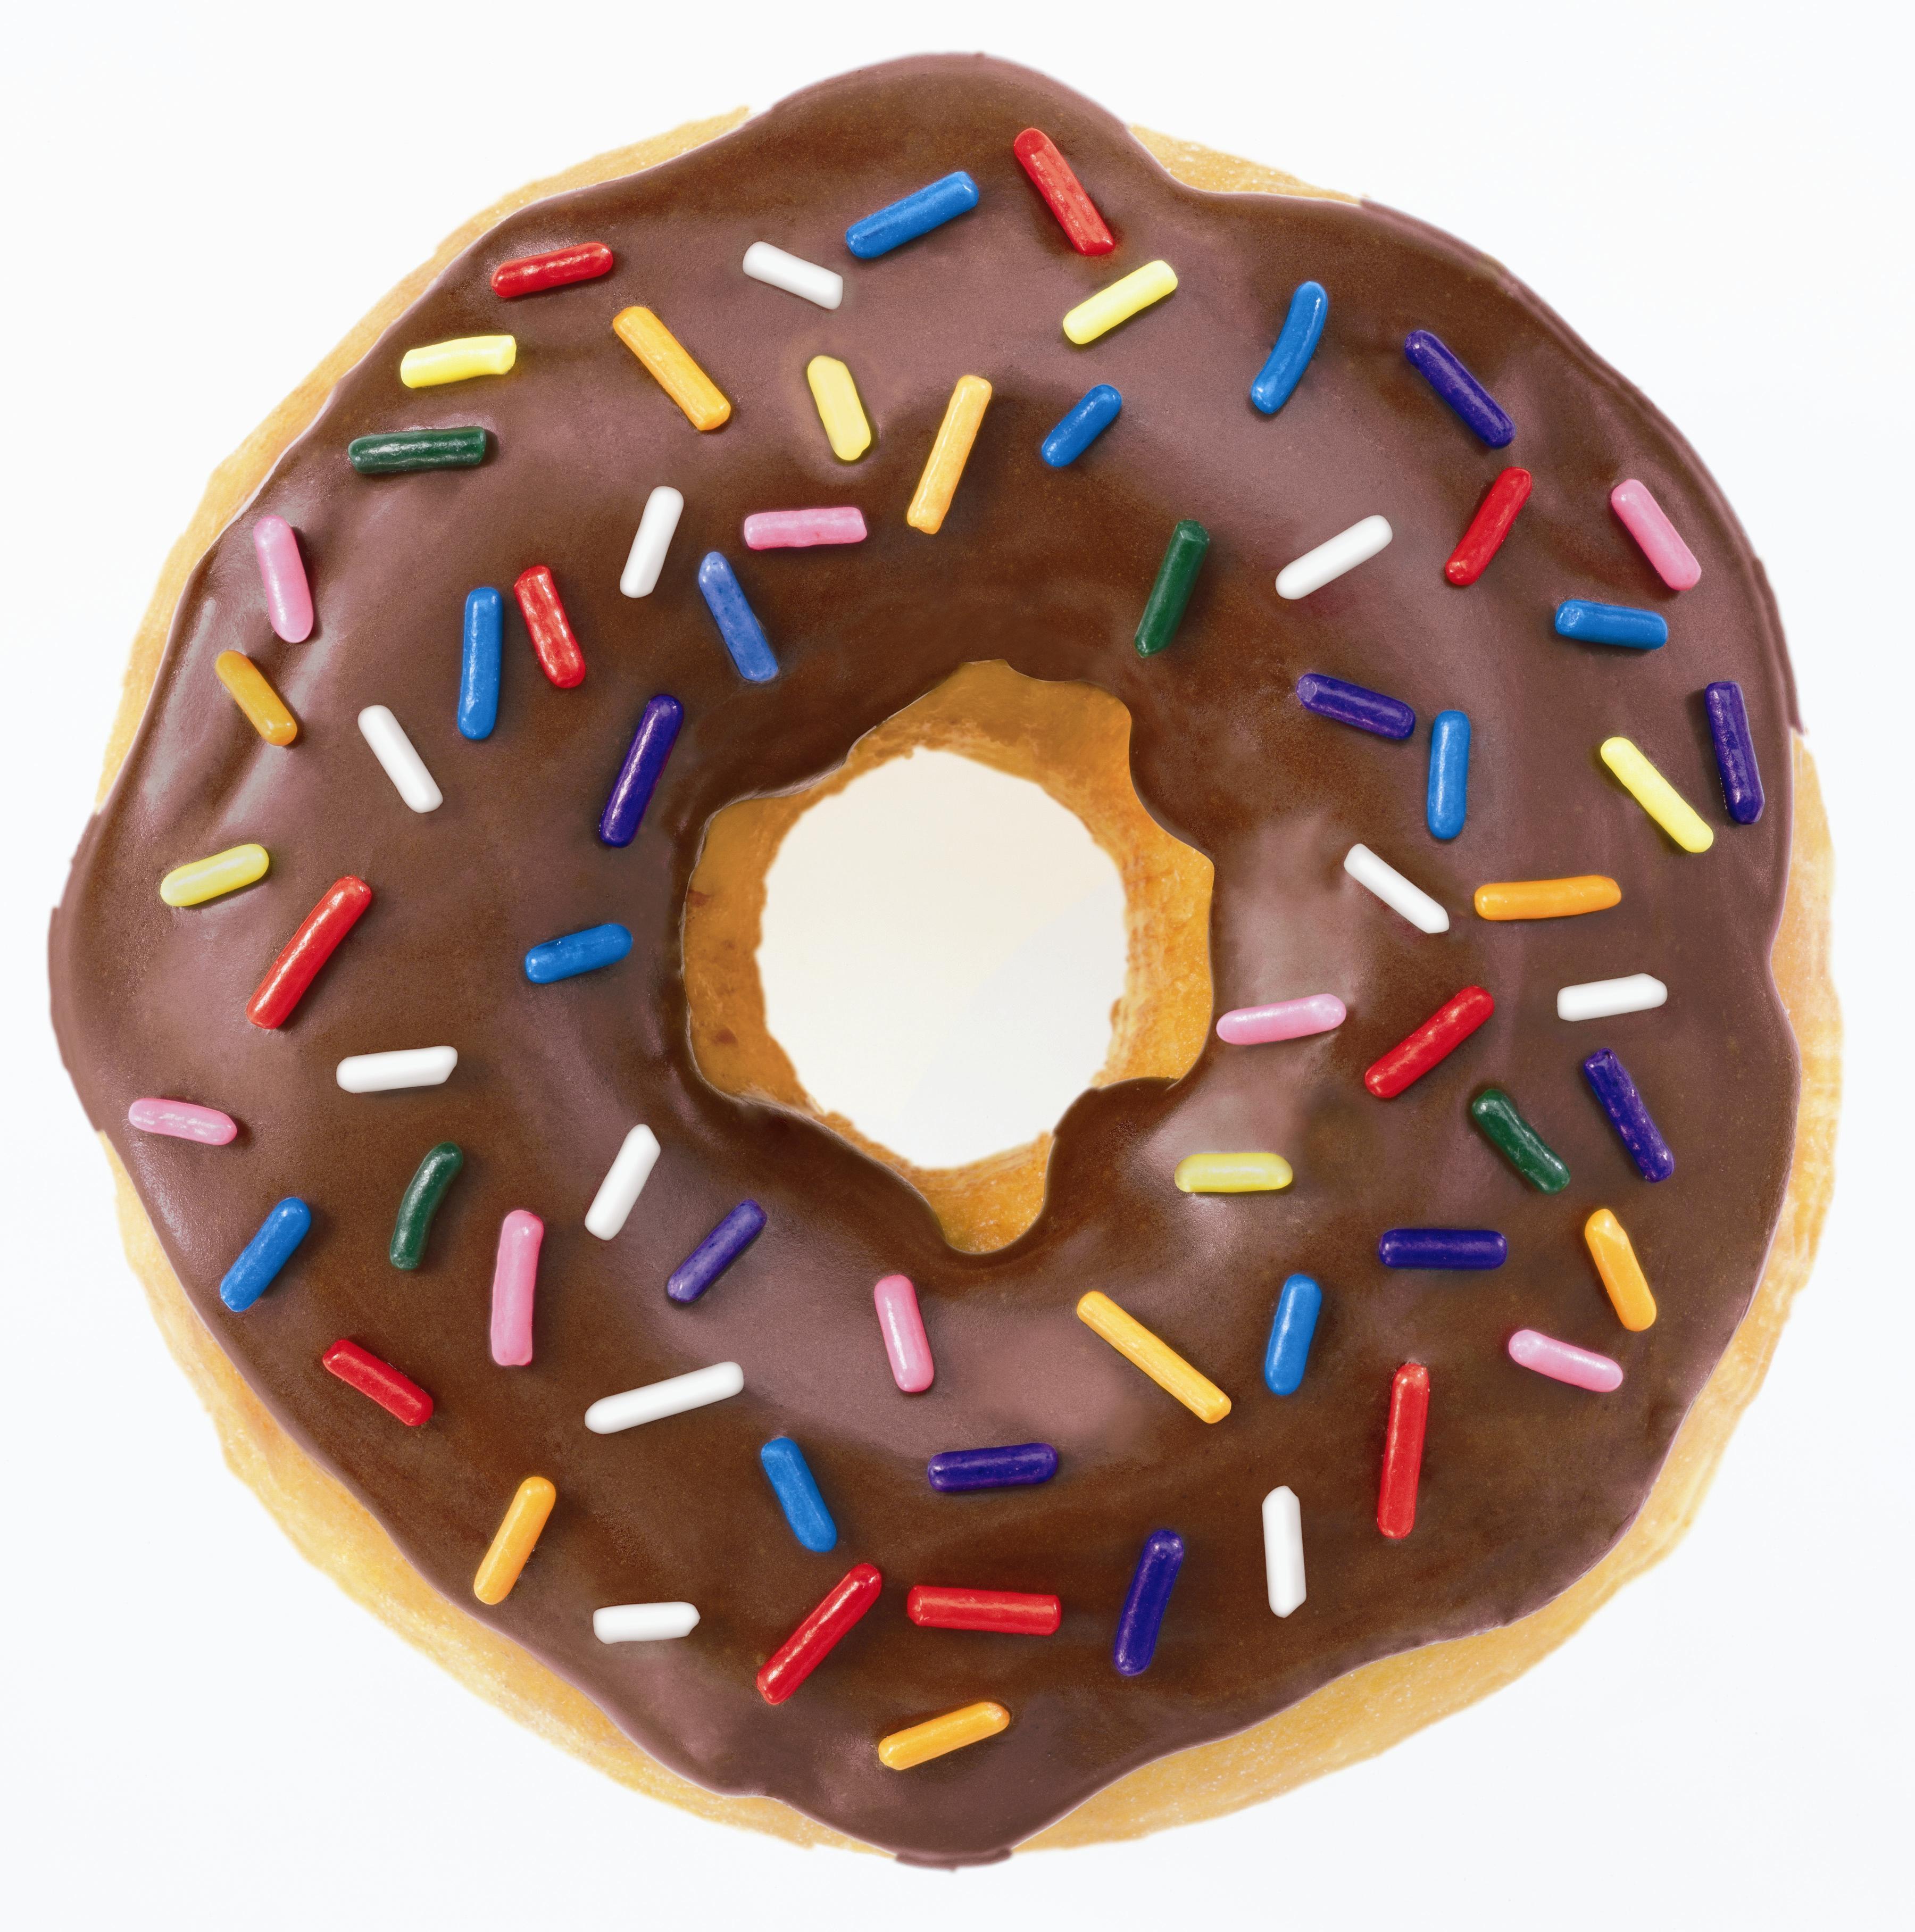 Doughnut Fan Group - Mod DB